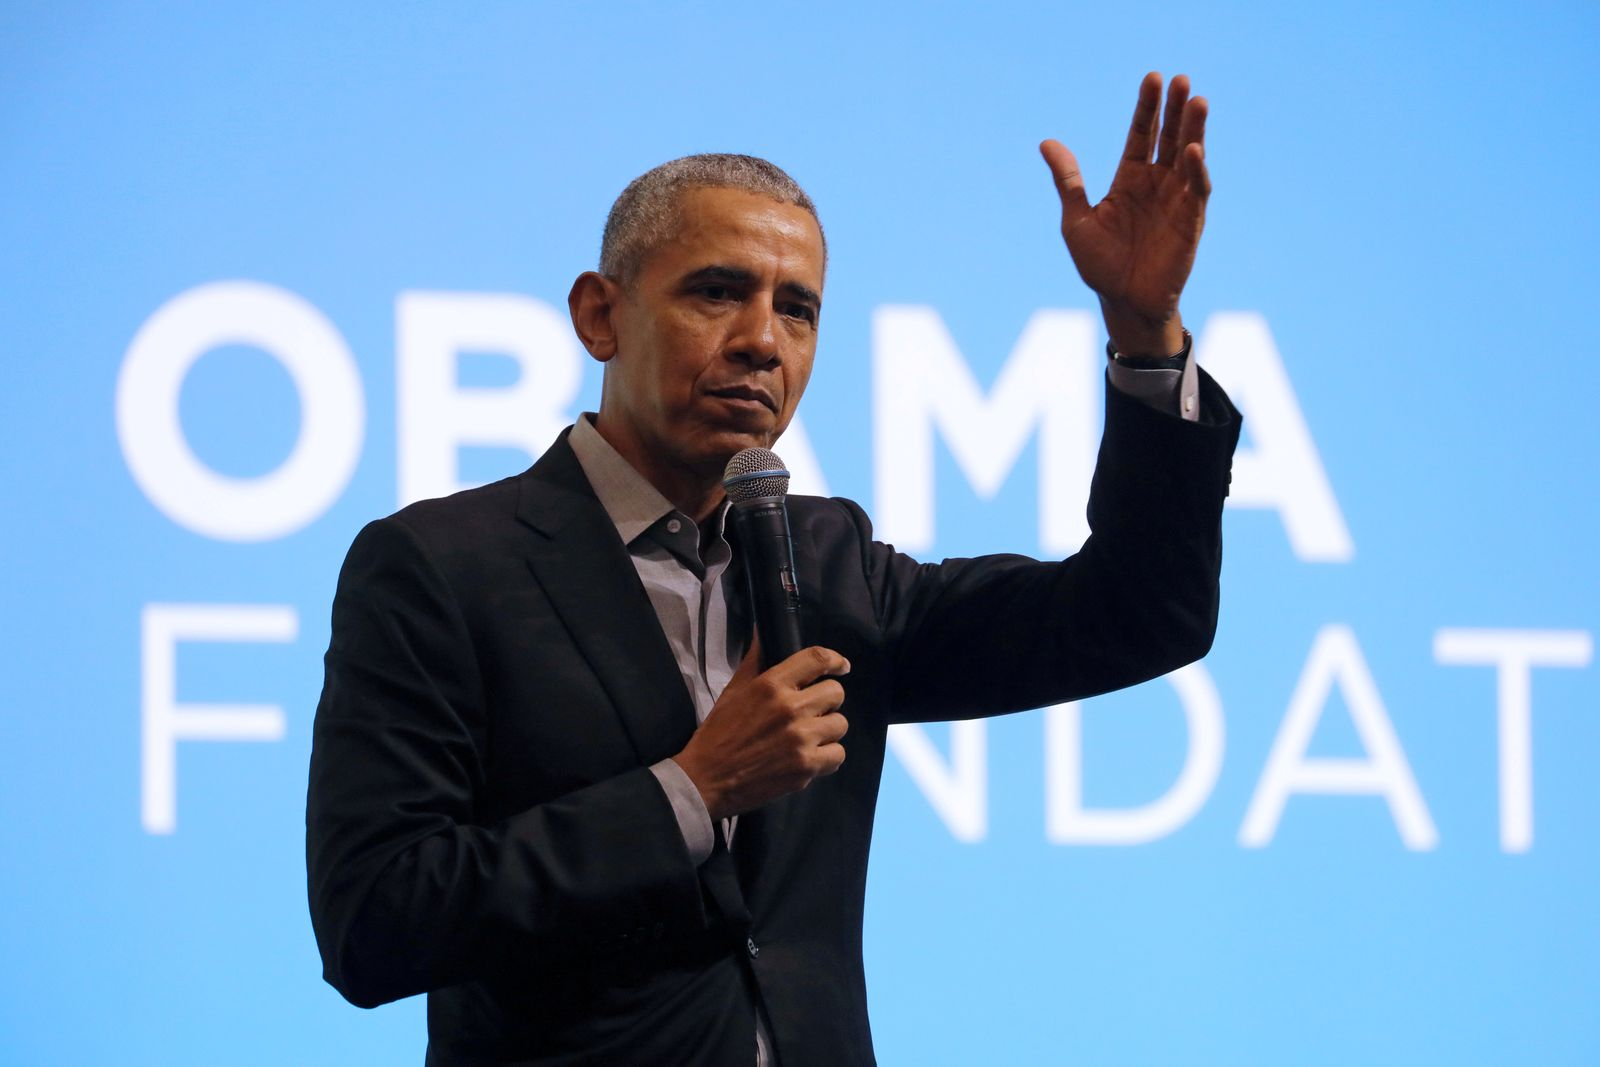 FILE PHOTO: Former U.S. President Barack Obama speaks during an Obama Foundation event in Kuala Lumpur